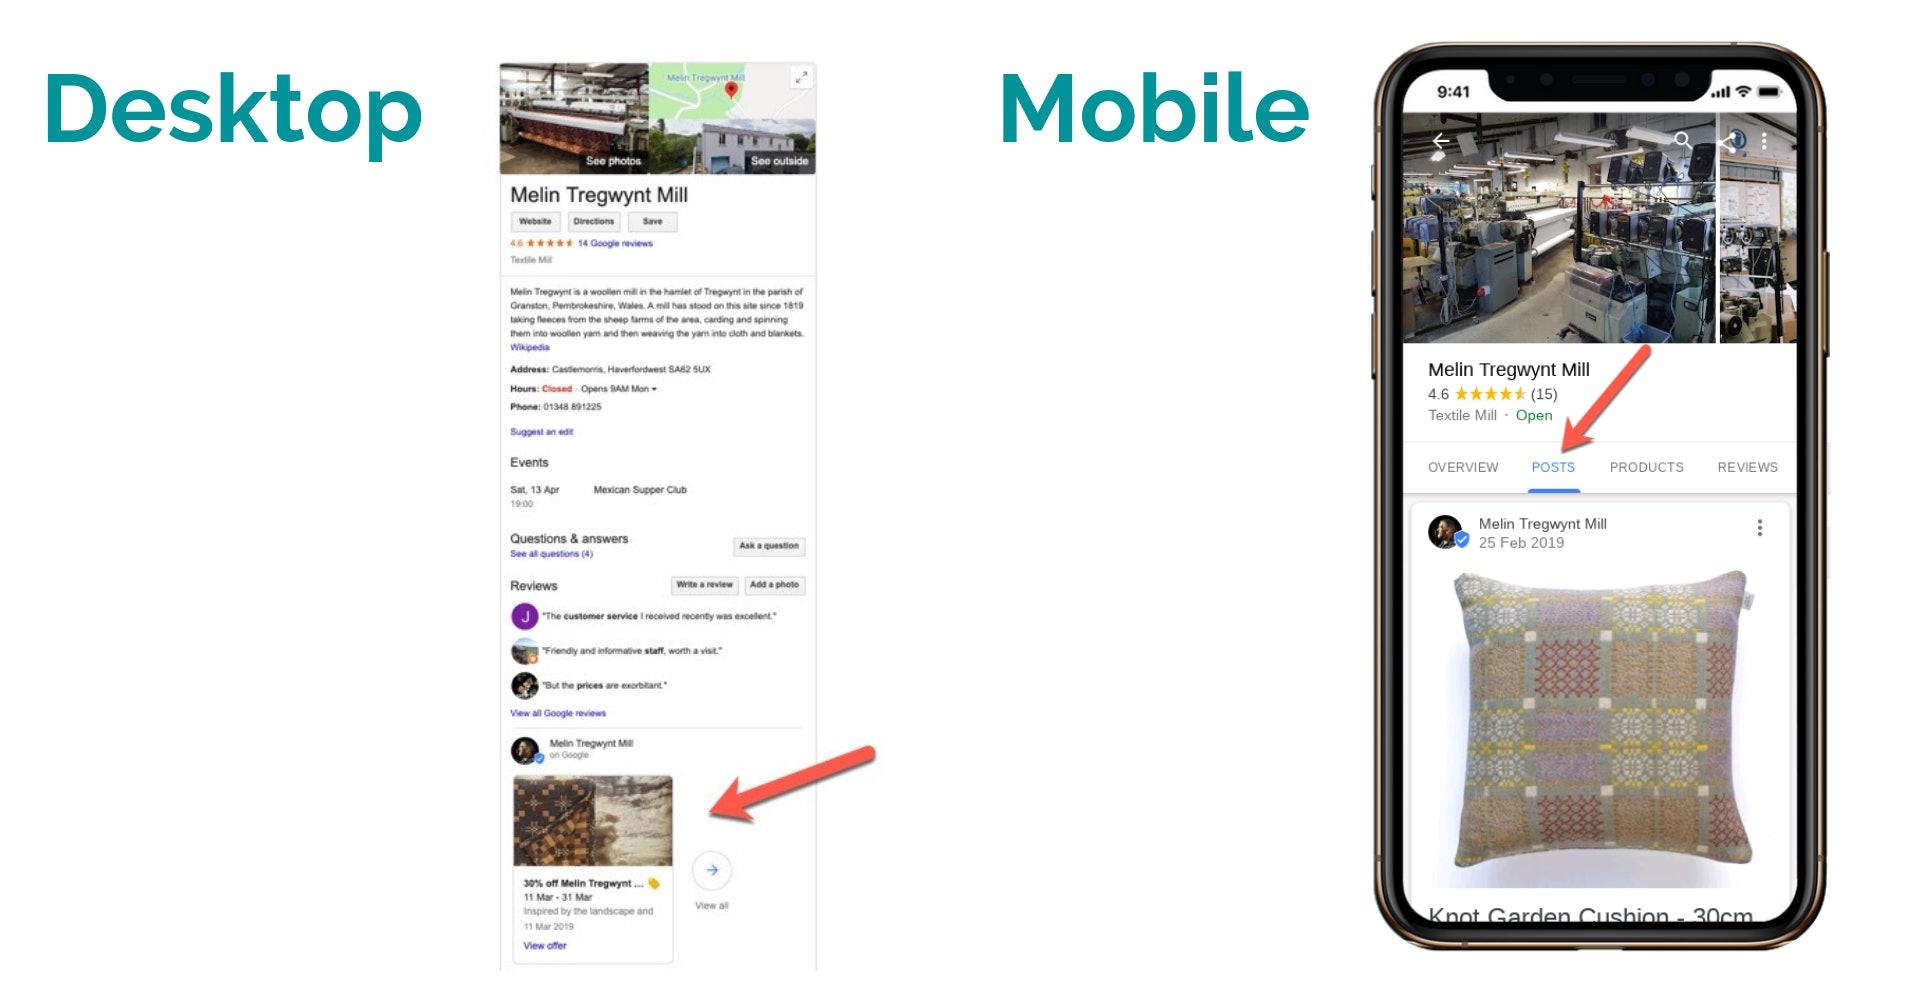 Desktop and Mobile GMB Posts